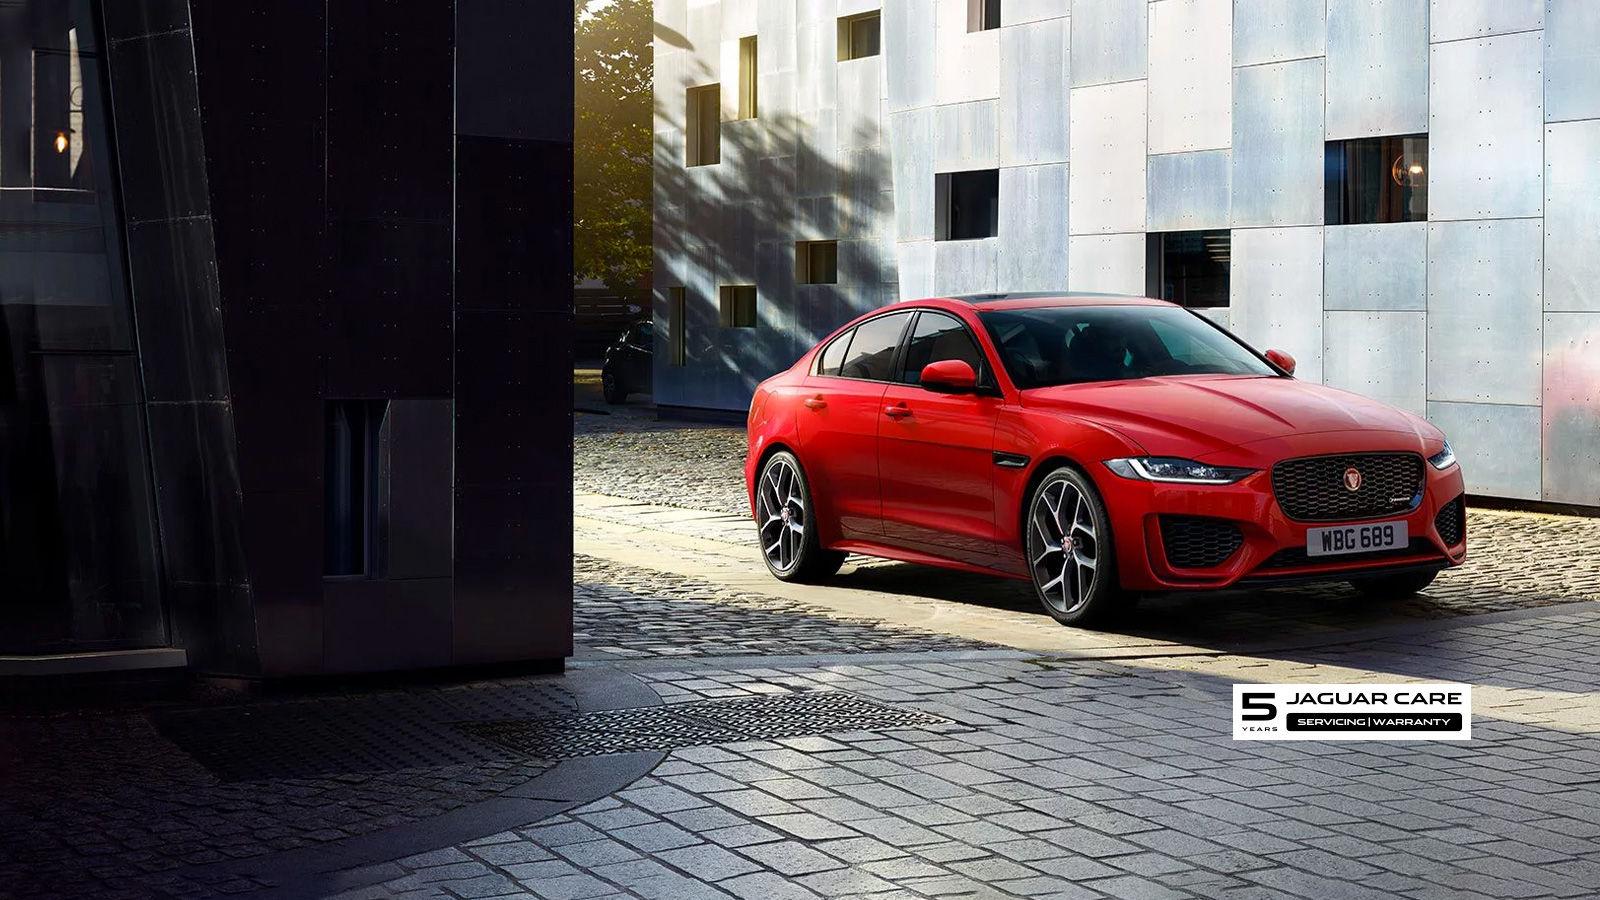 Jaguar Luxury Sedan Sports 4x4 Cars Jaguar 台灣